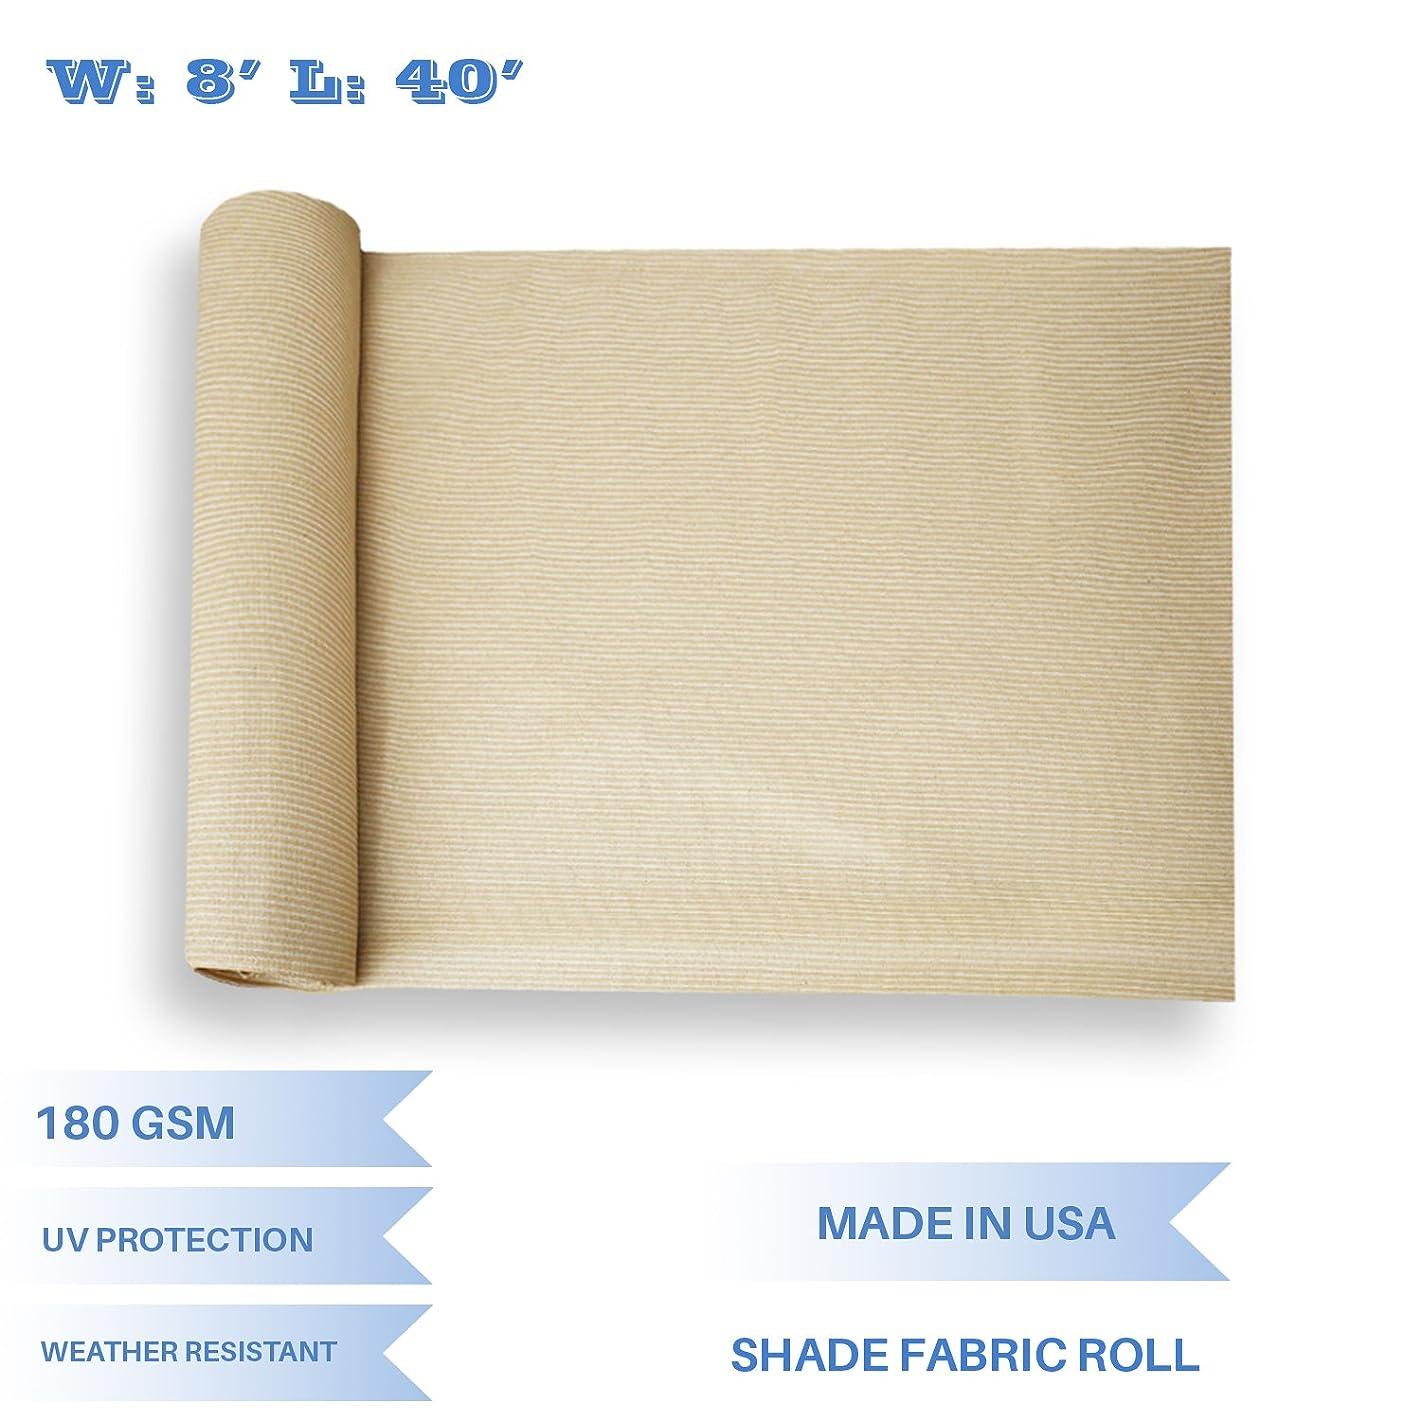 E&K Sunrise 8' x 40' Beige Sun Shade Fabric Sunblock Shade Cloth Roll, 95% UV Resistant Mesh Netting Cover for Outdoor,Backyard,Garden,Greenhouse,Barn,Plant (Customized